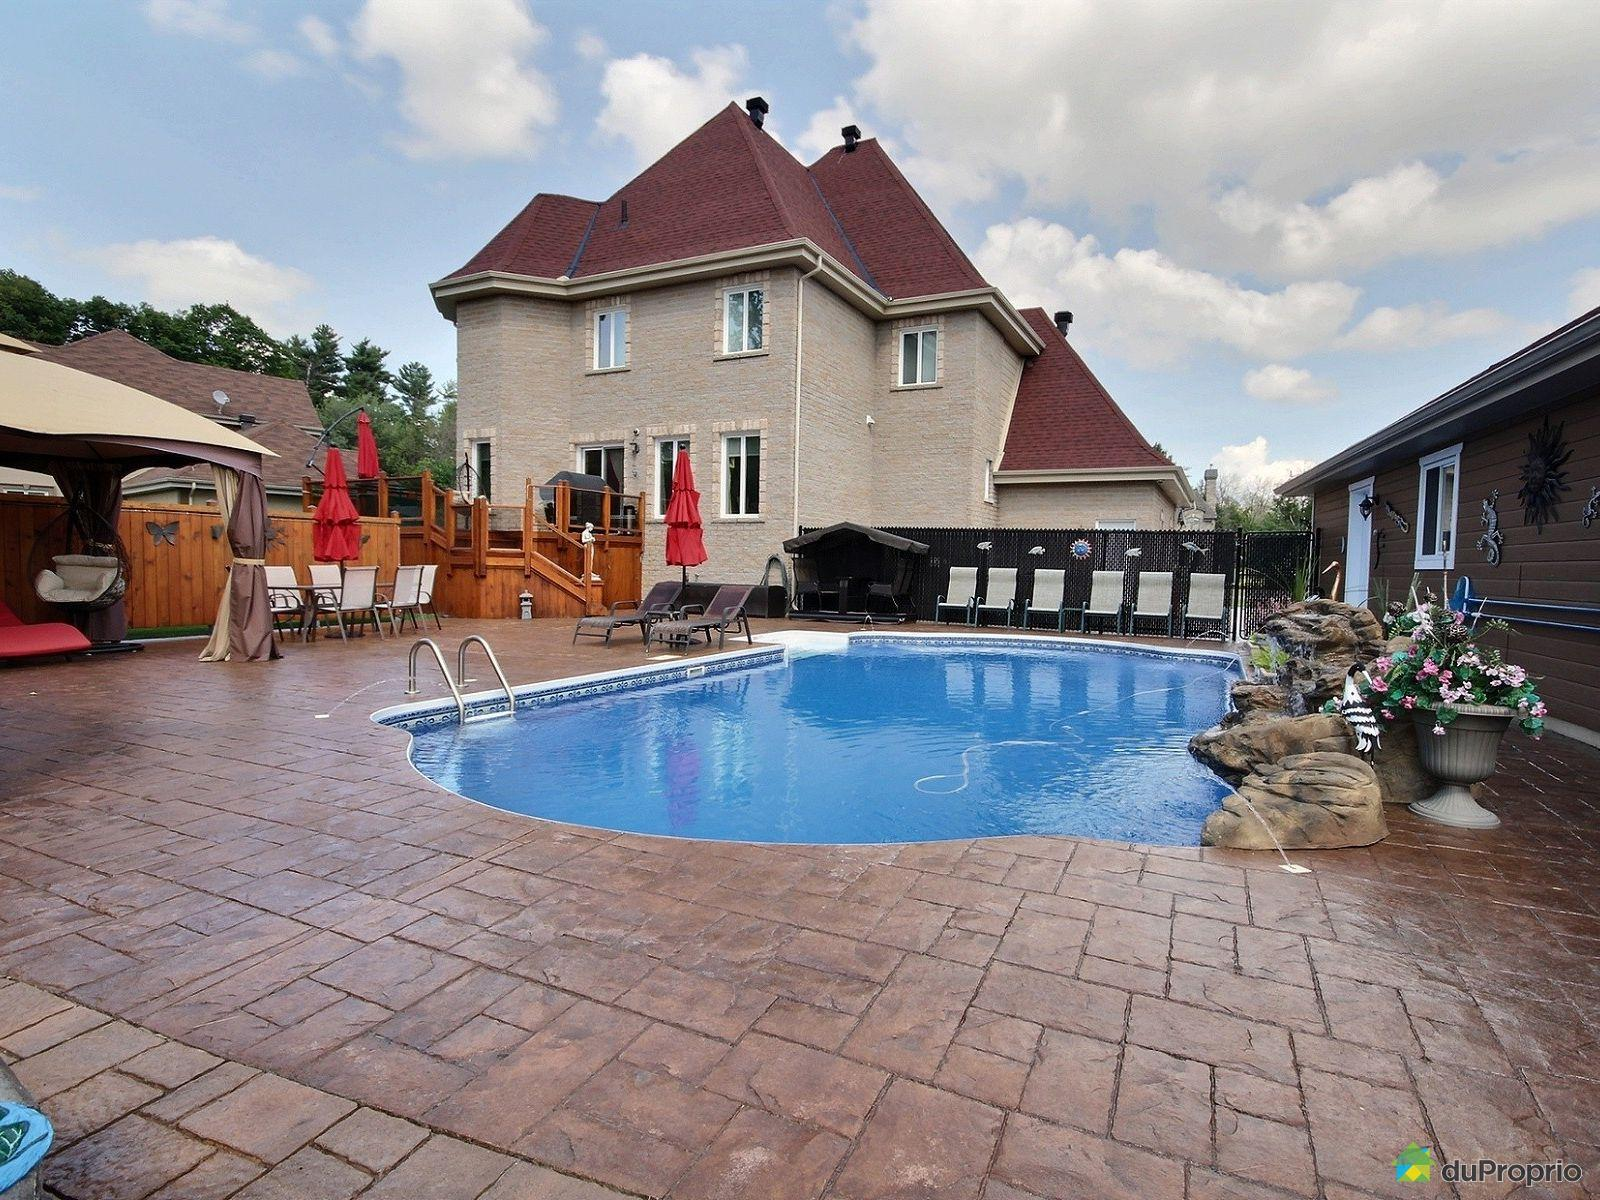 maison-a-vendre-gatineau-aylmer-quebec-province-1600-6353713.jpg